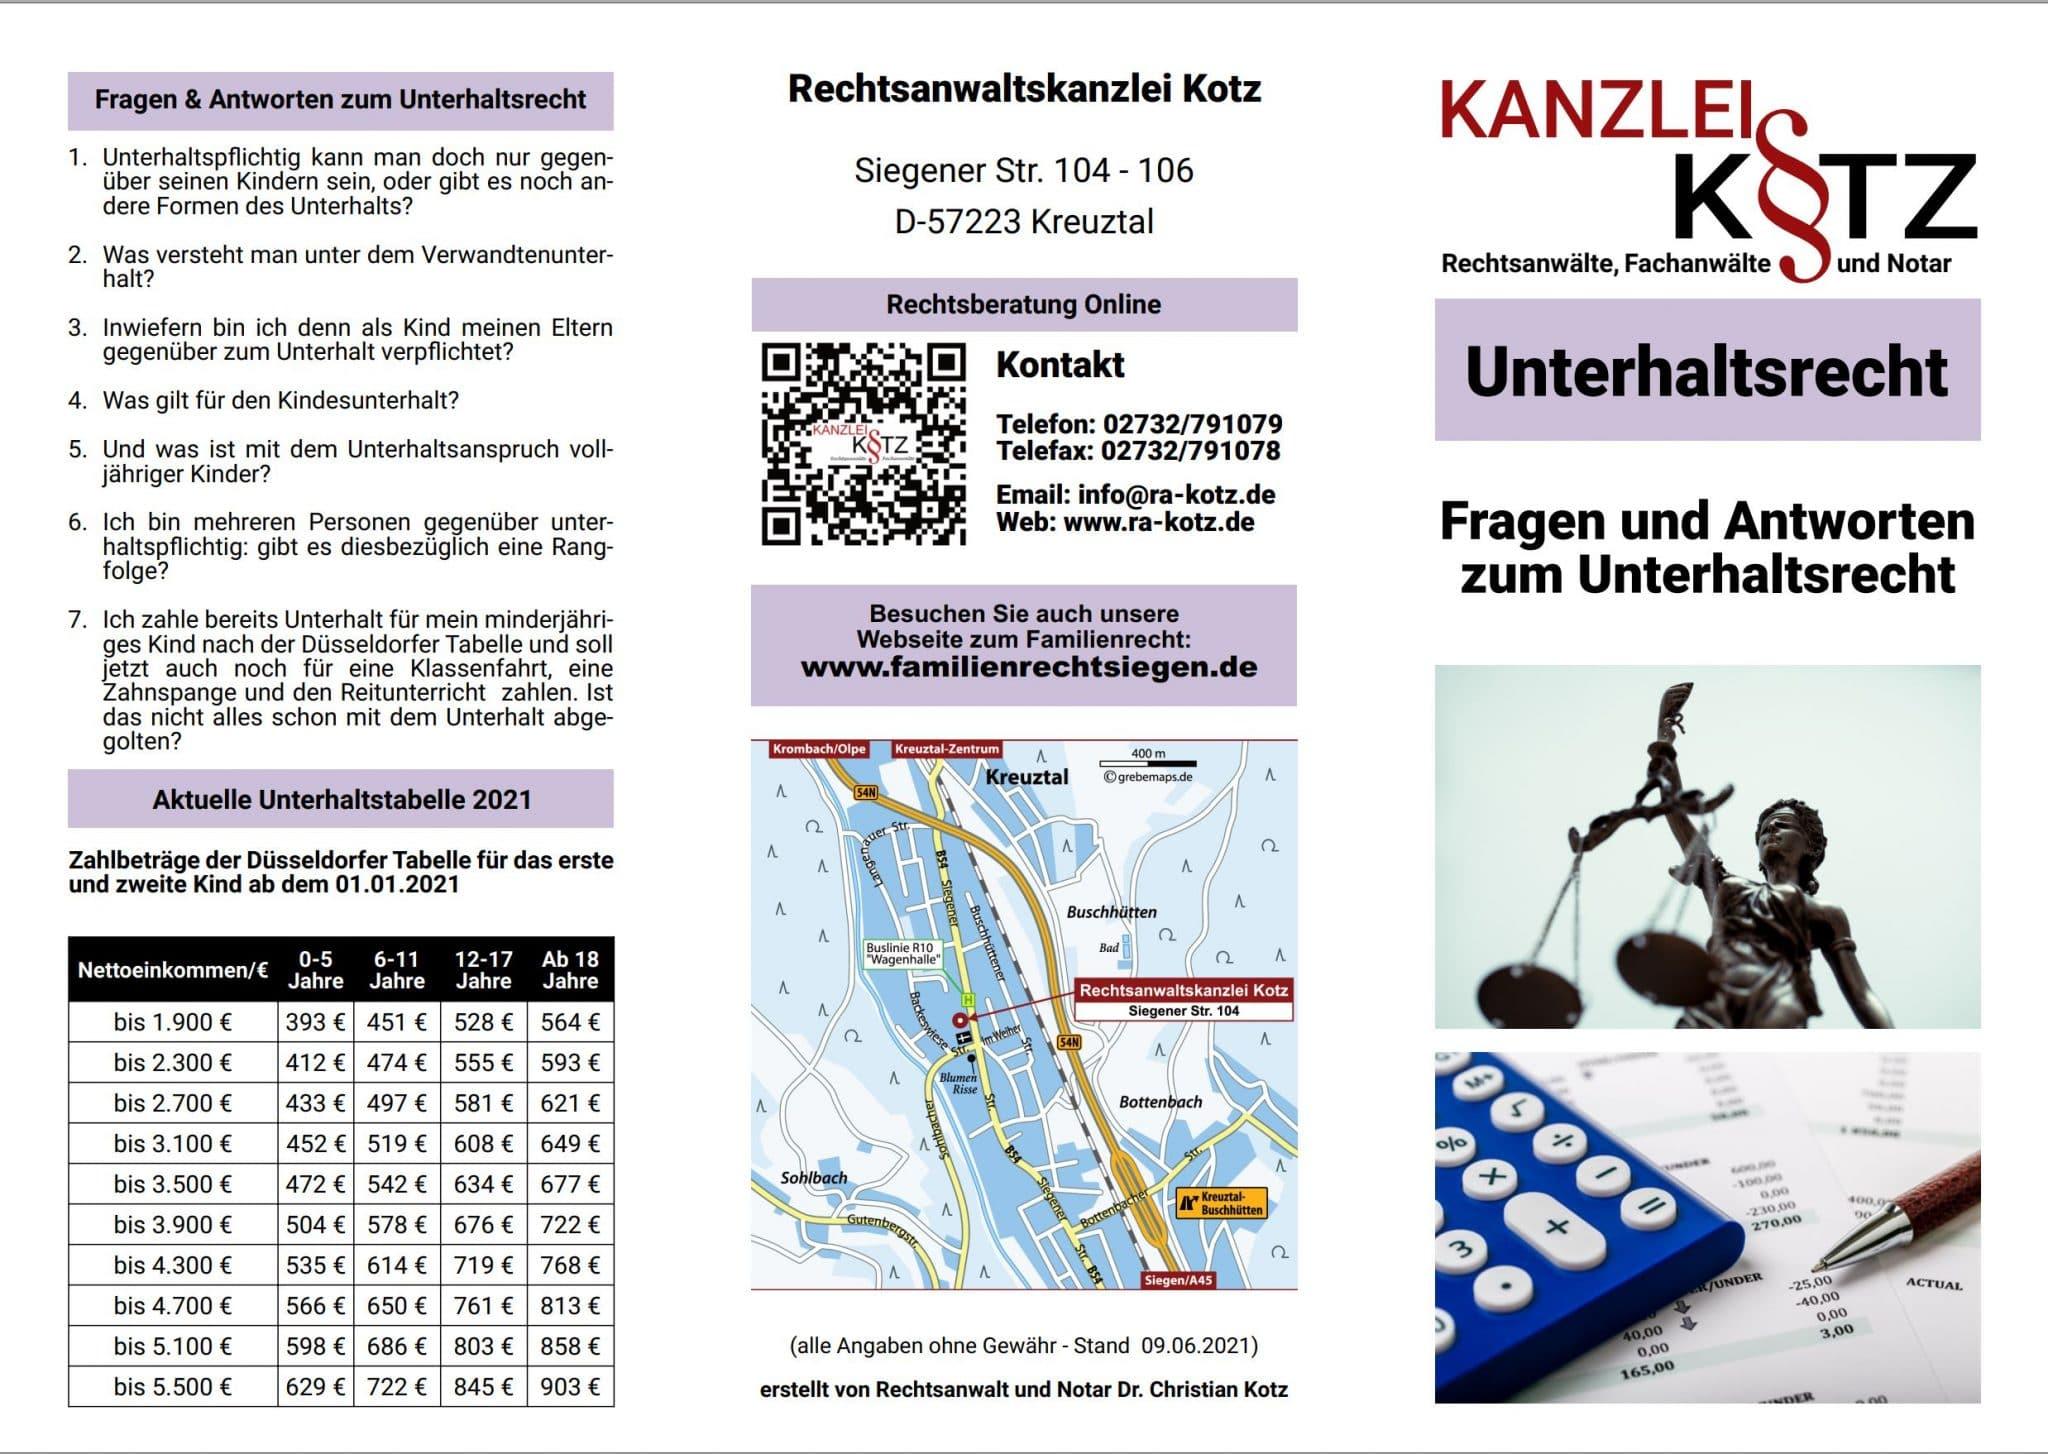 Unterhaltsrecht Broschüre 2021